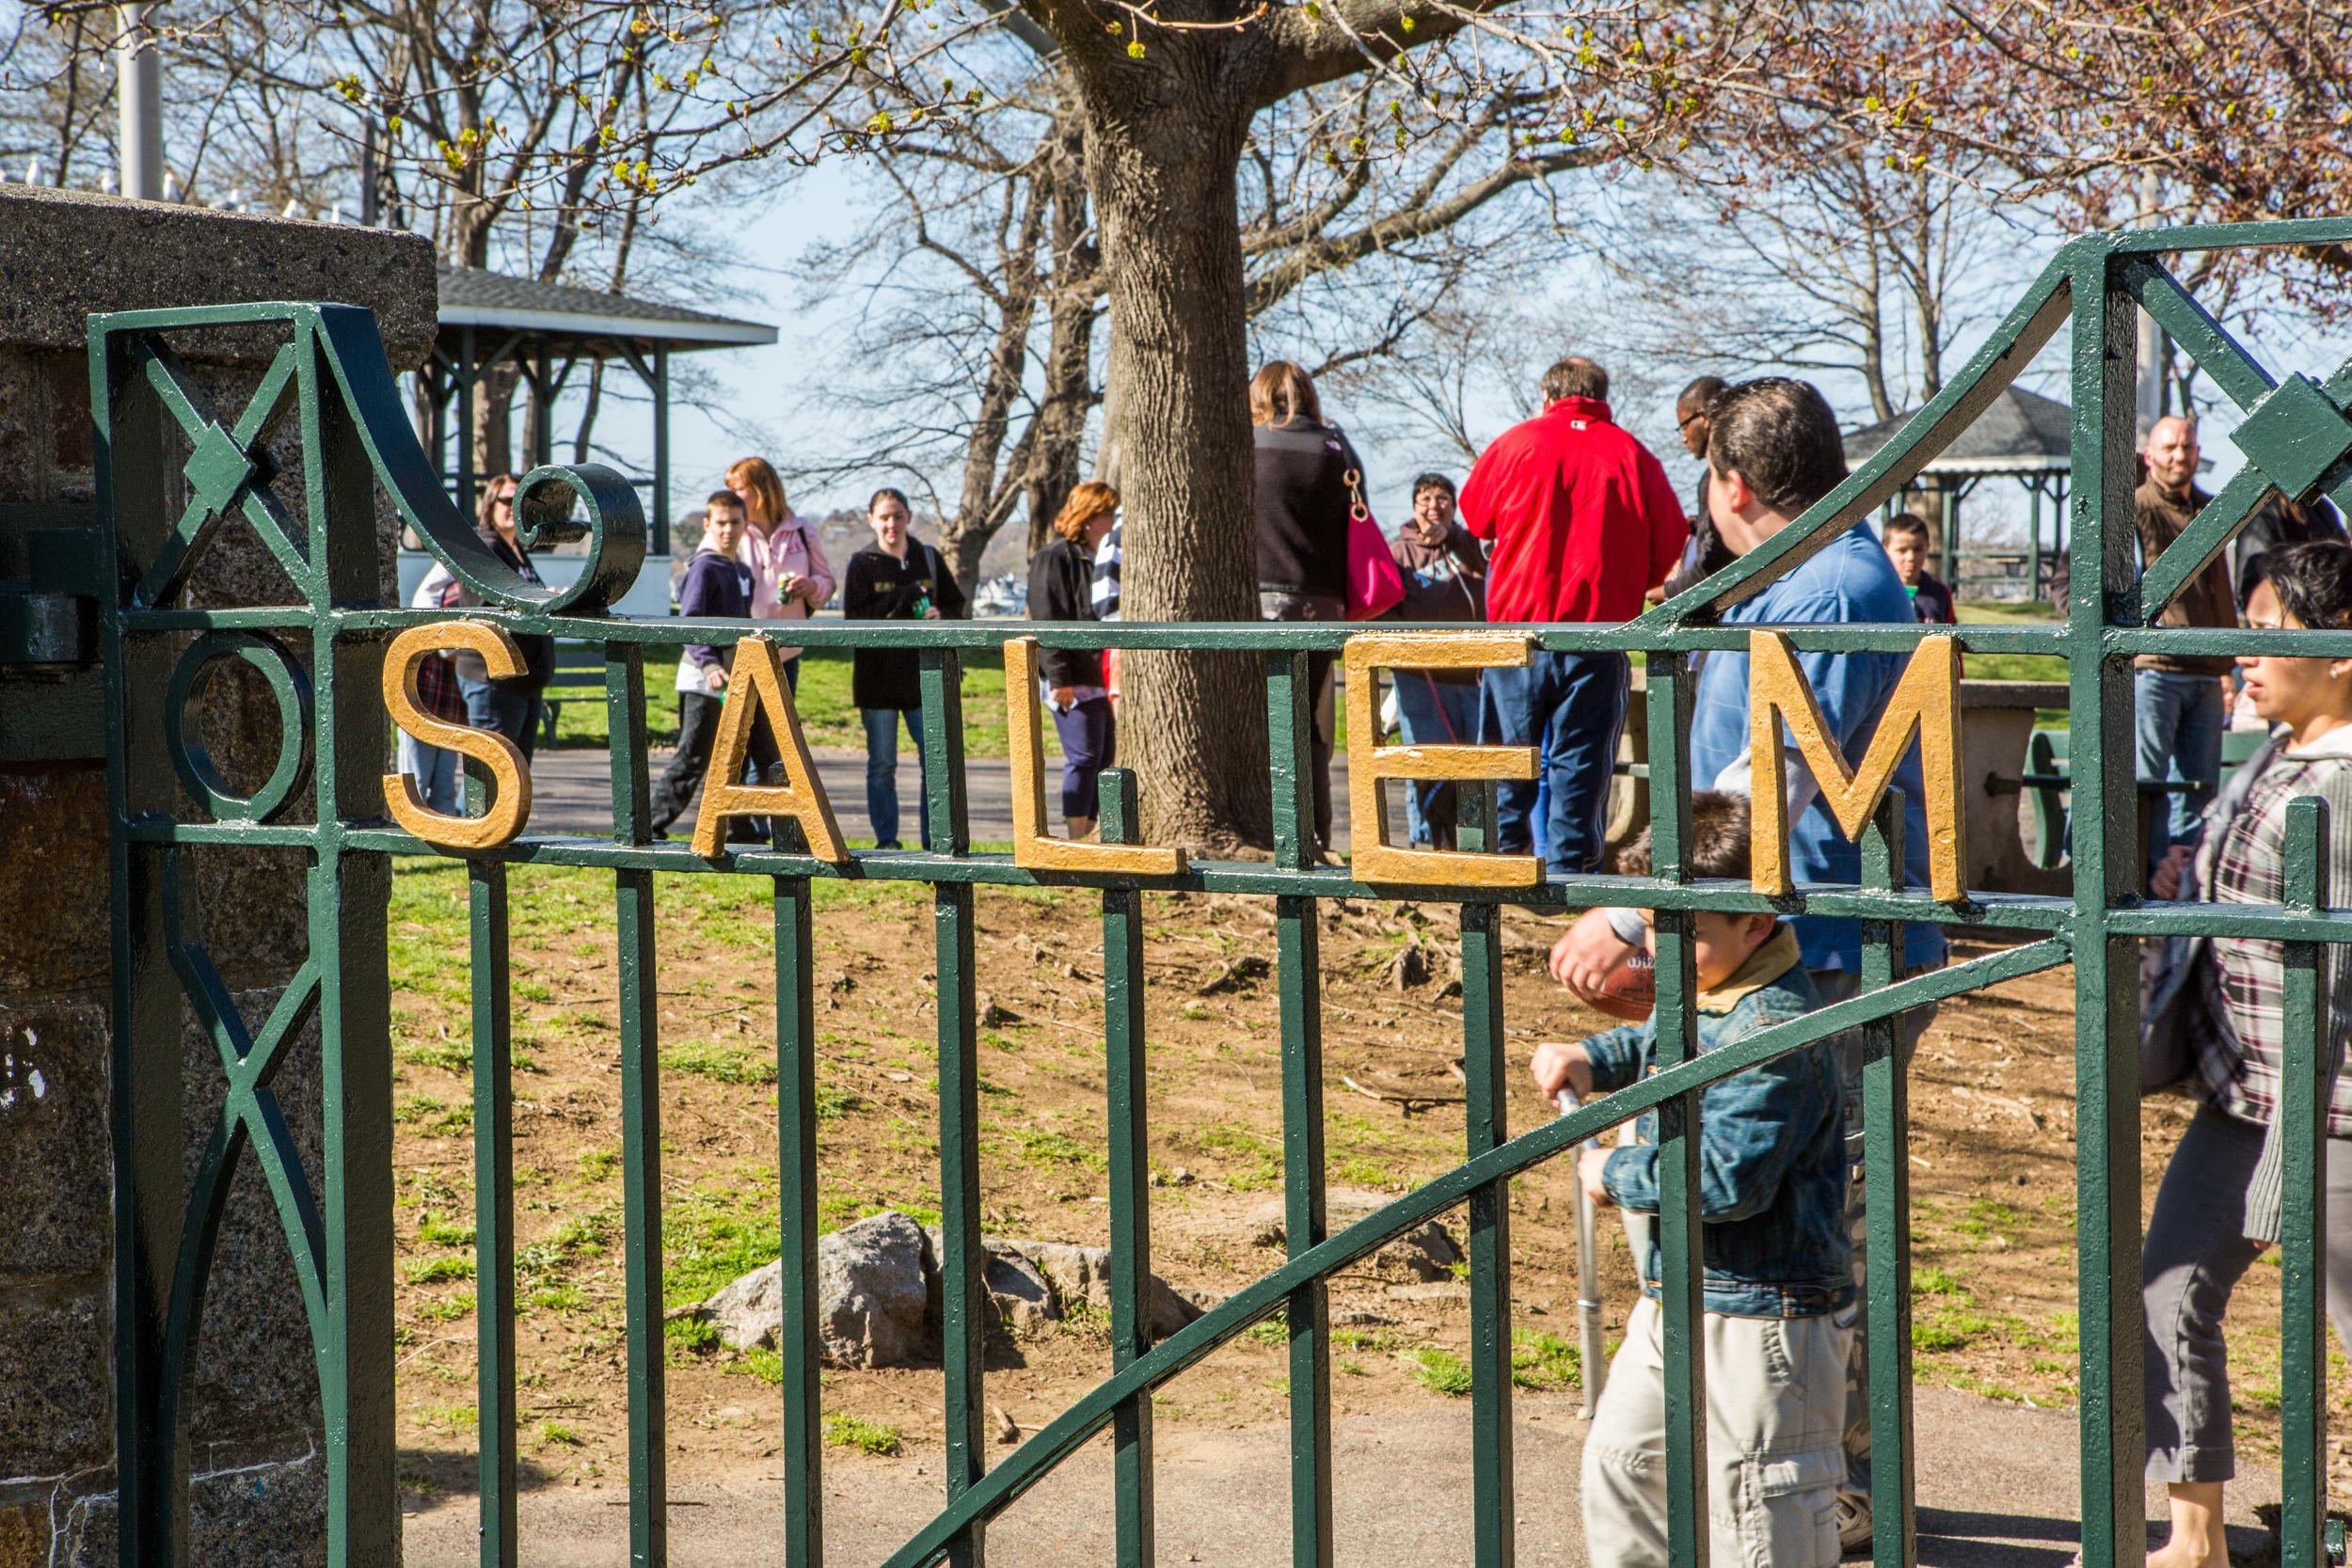 The Salem Willows Gates